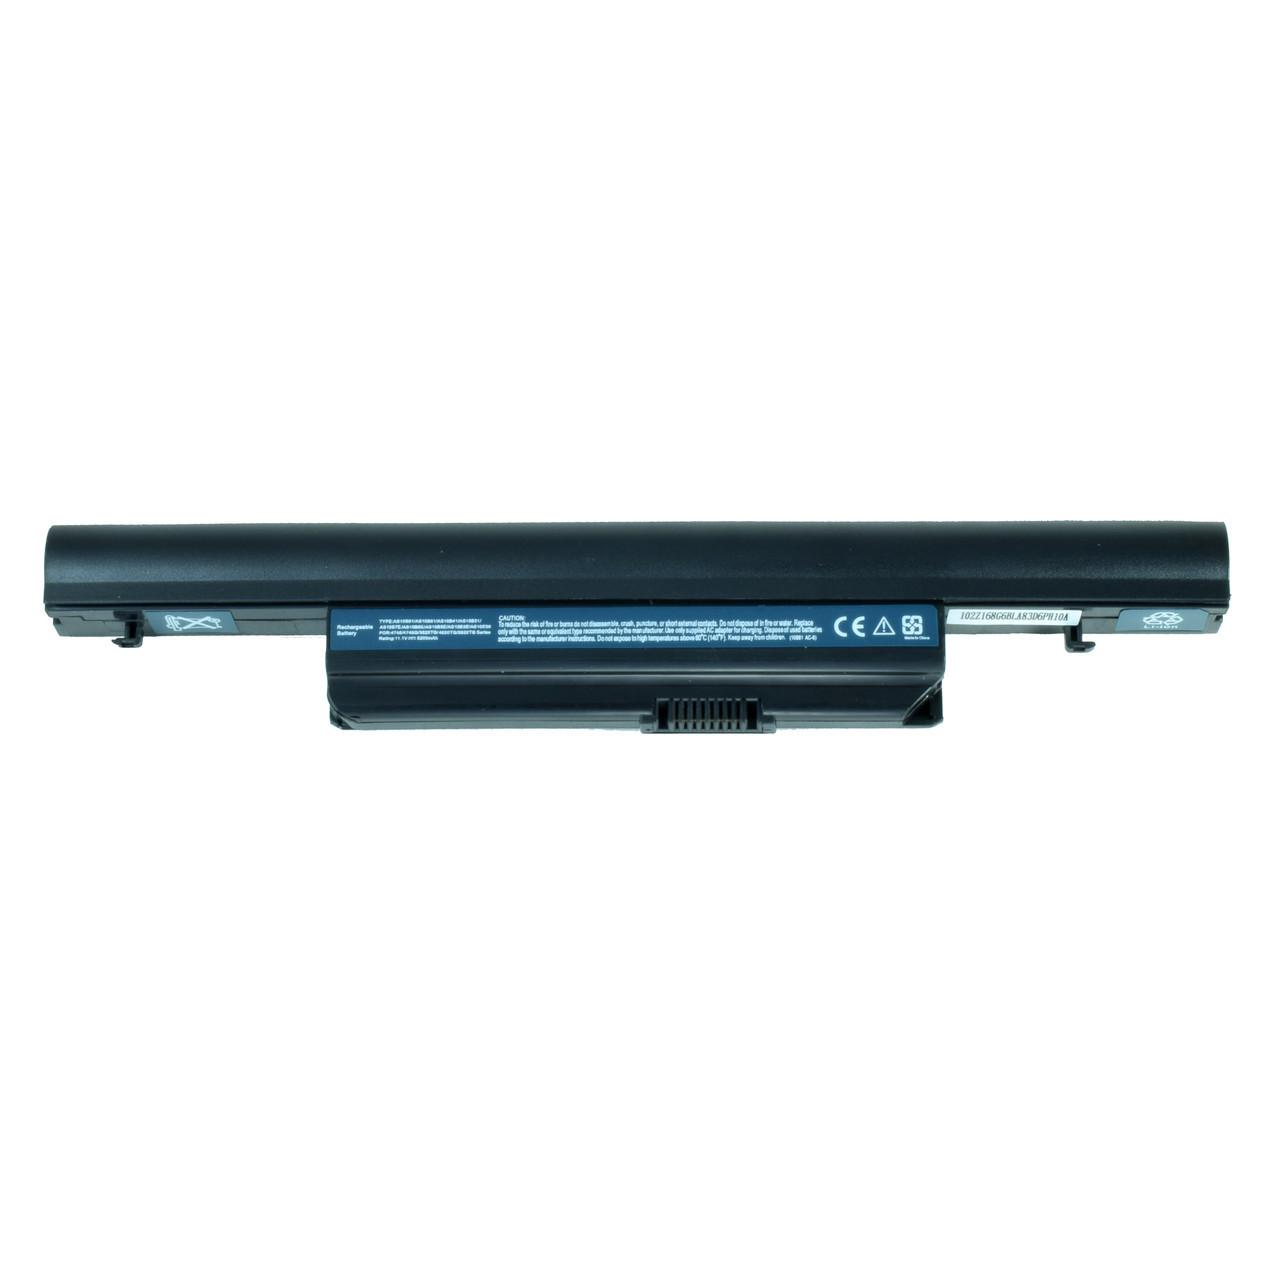 Батарея для ноутбука ACER AS10B5E AS10B61 AS10B6E AS10B71 AS10B73 AS10B75 AS10B7E BT.00604.048